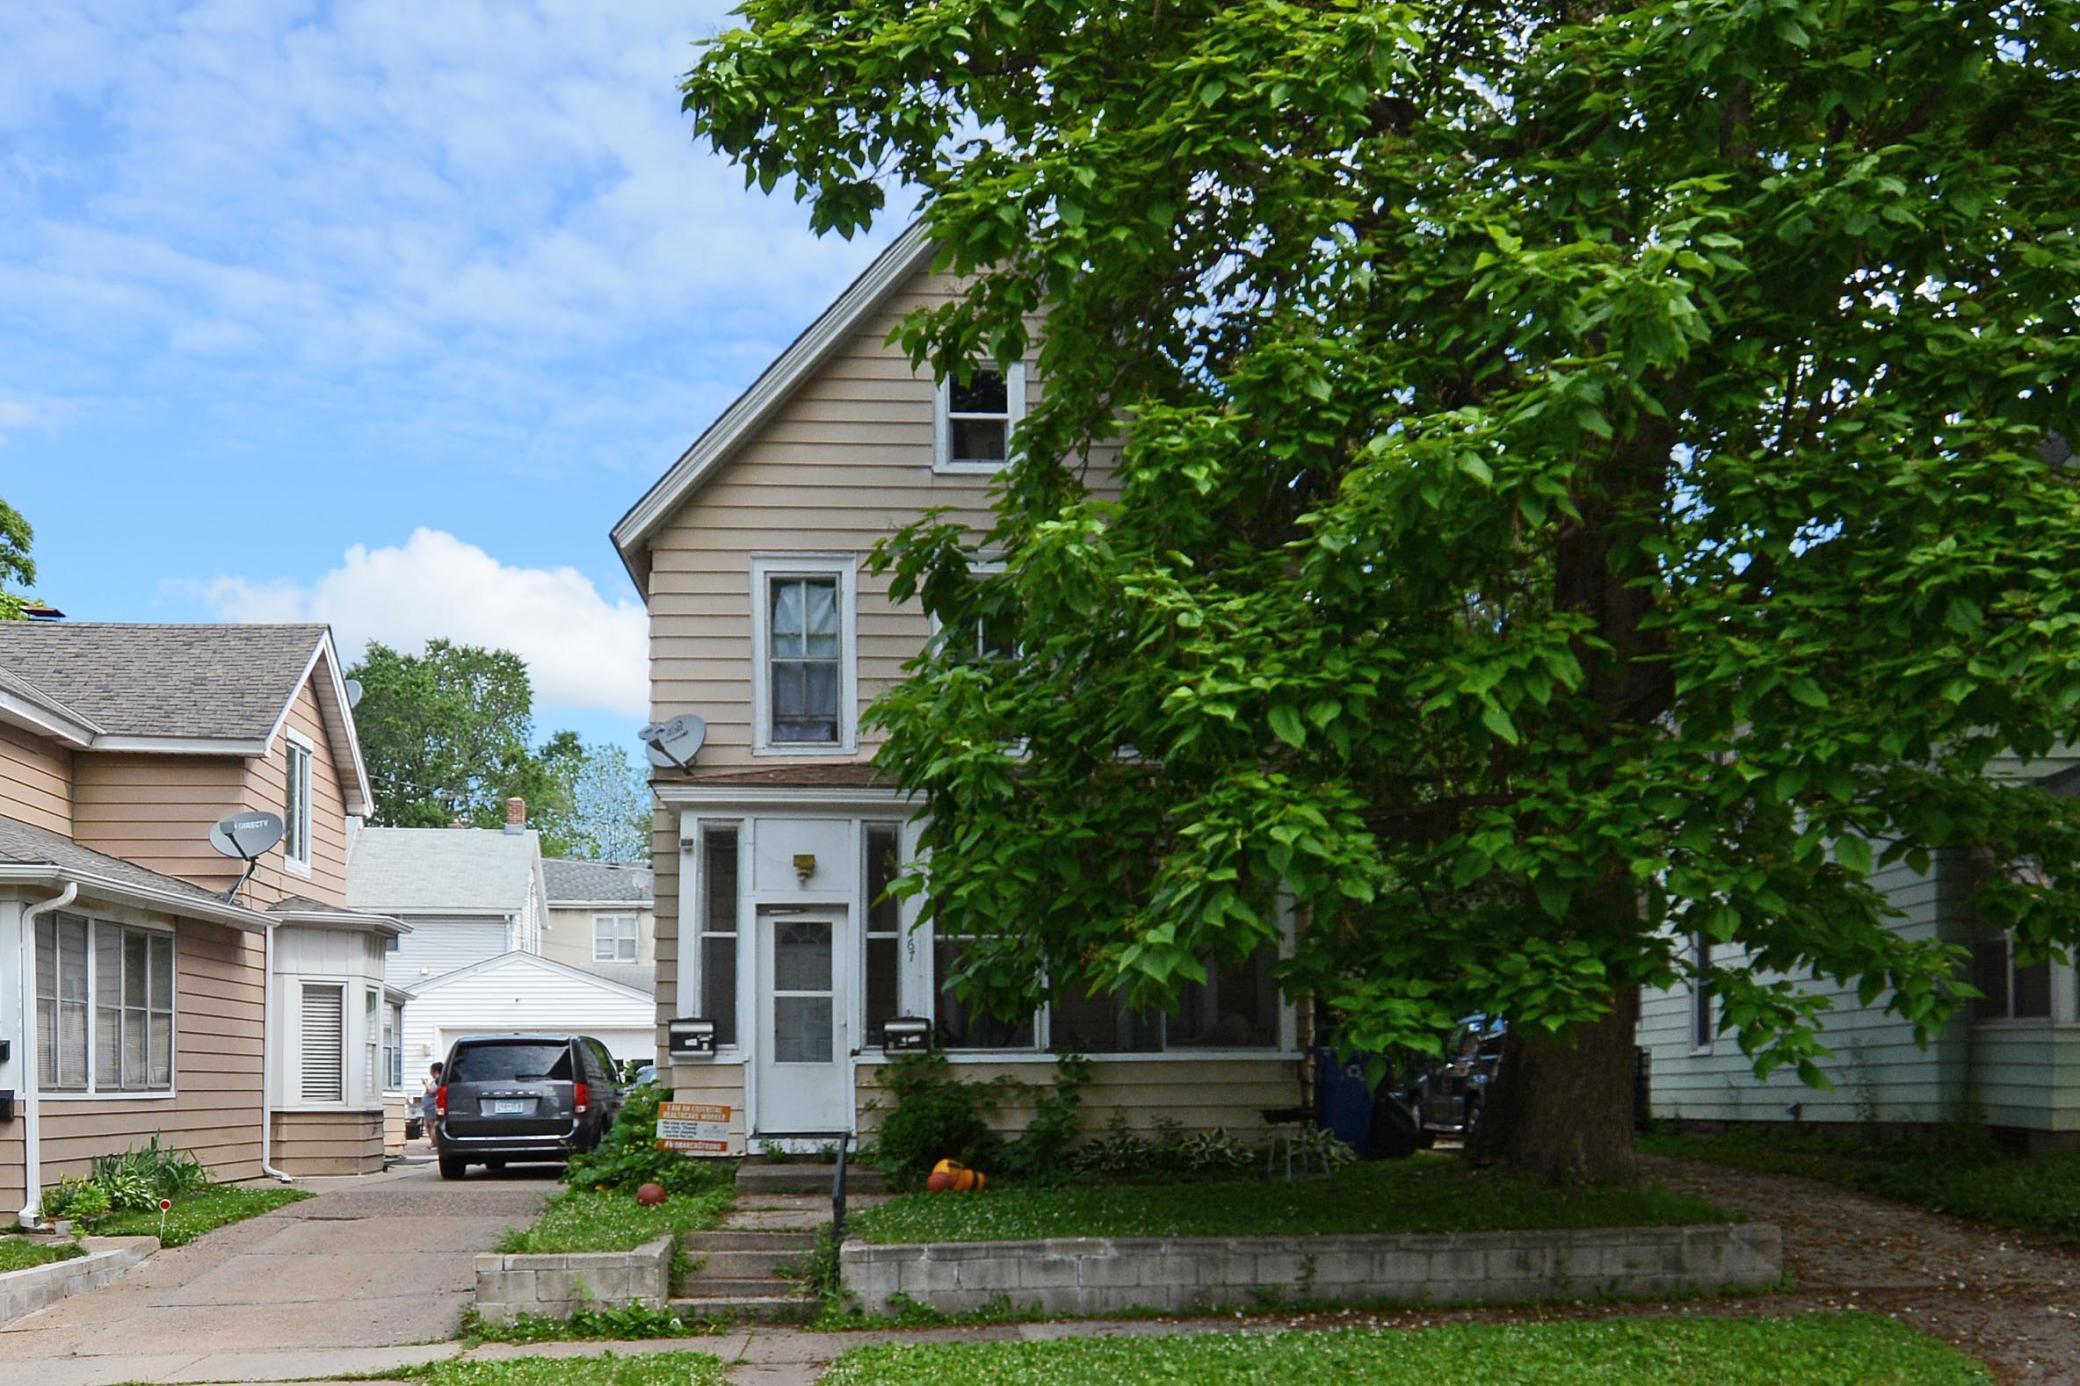 467 Beaumont Property Photo - Saint Paul, MN real estate listing